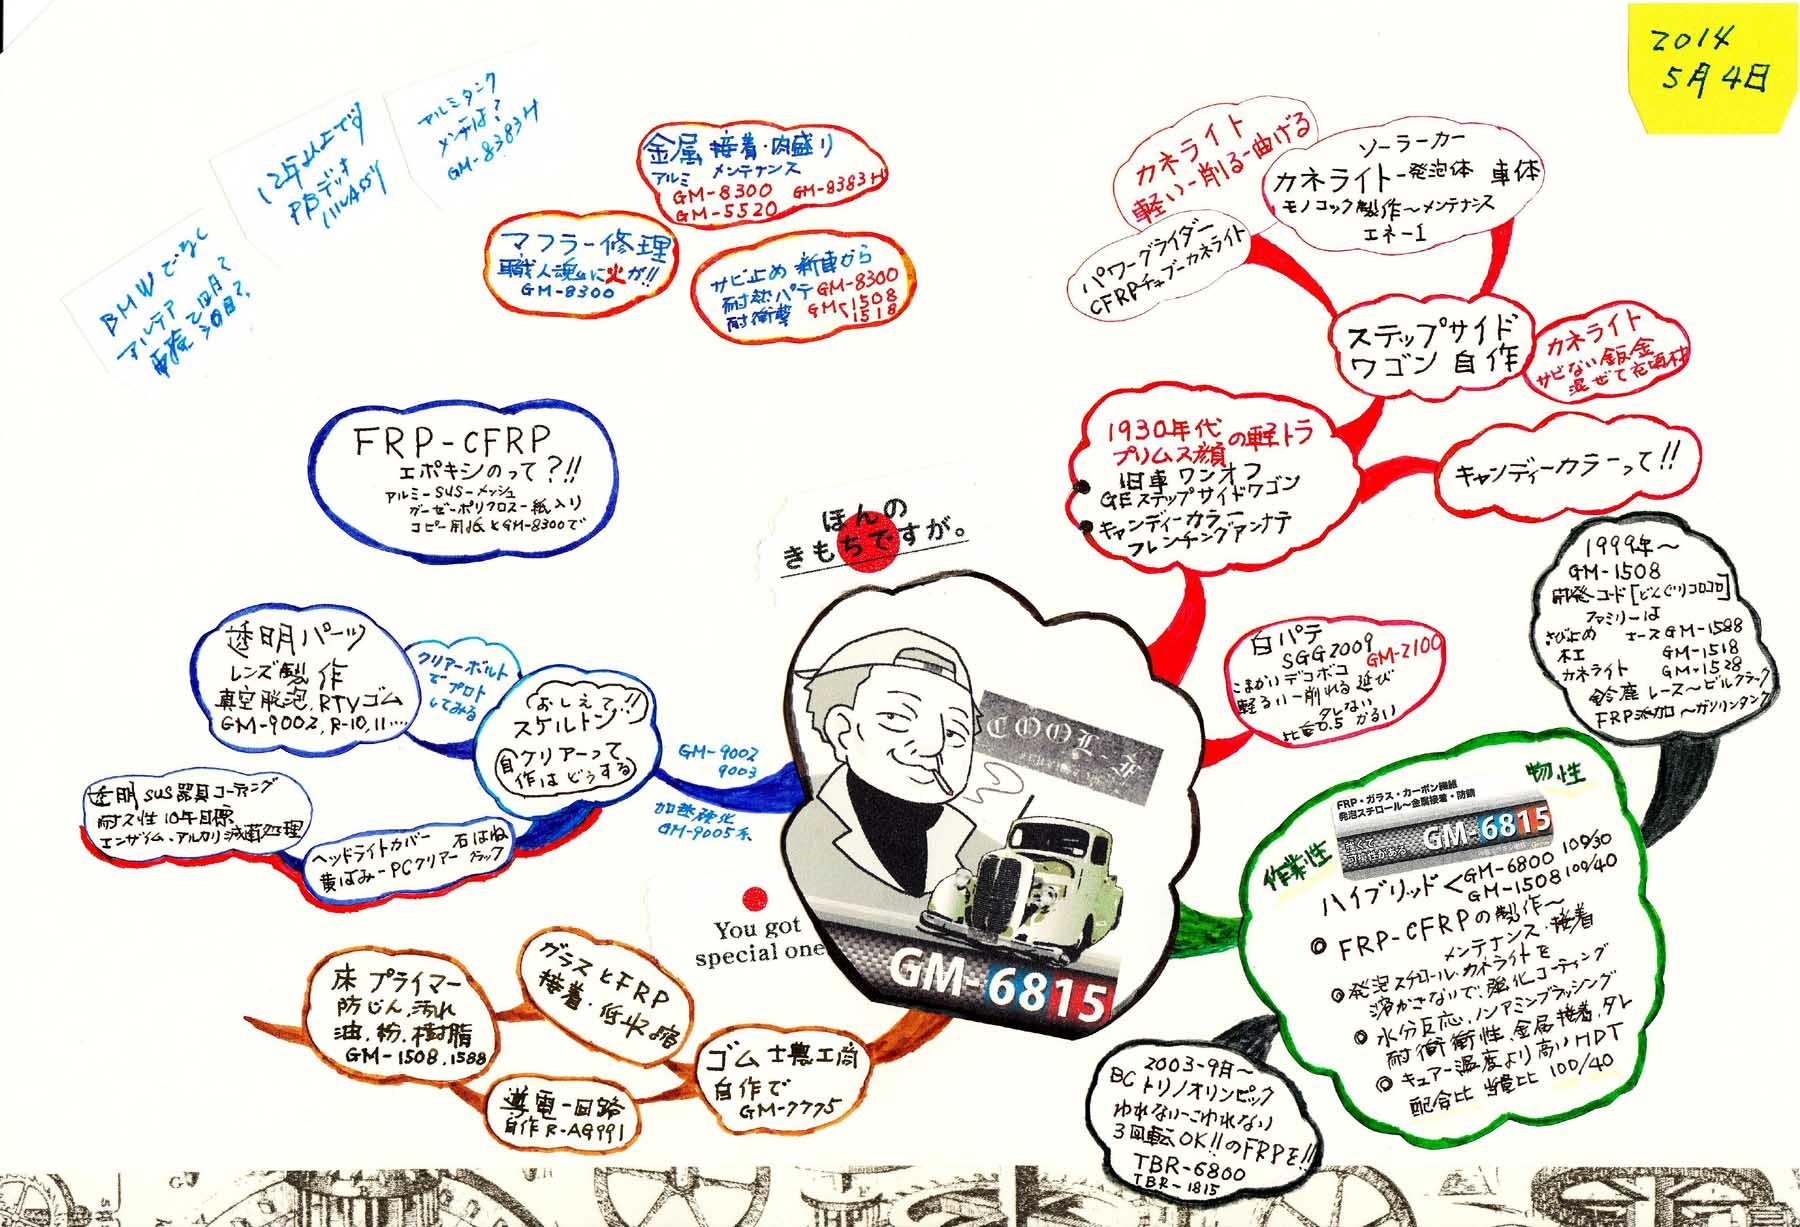 http://www.blenny.co.jp/images/20140504-1-1800p